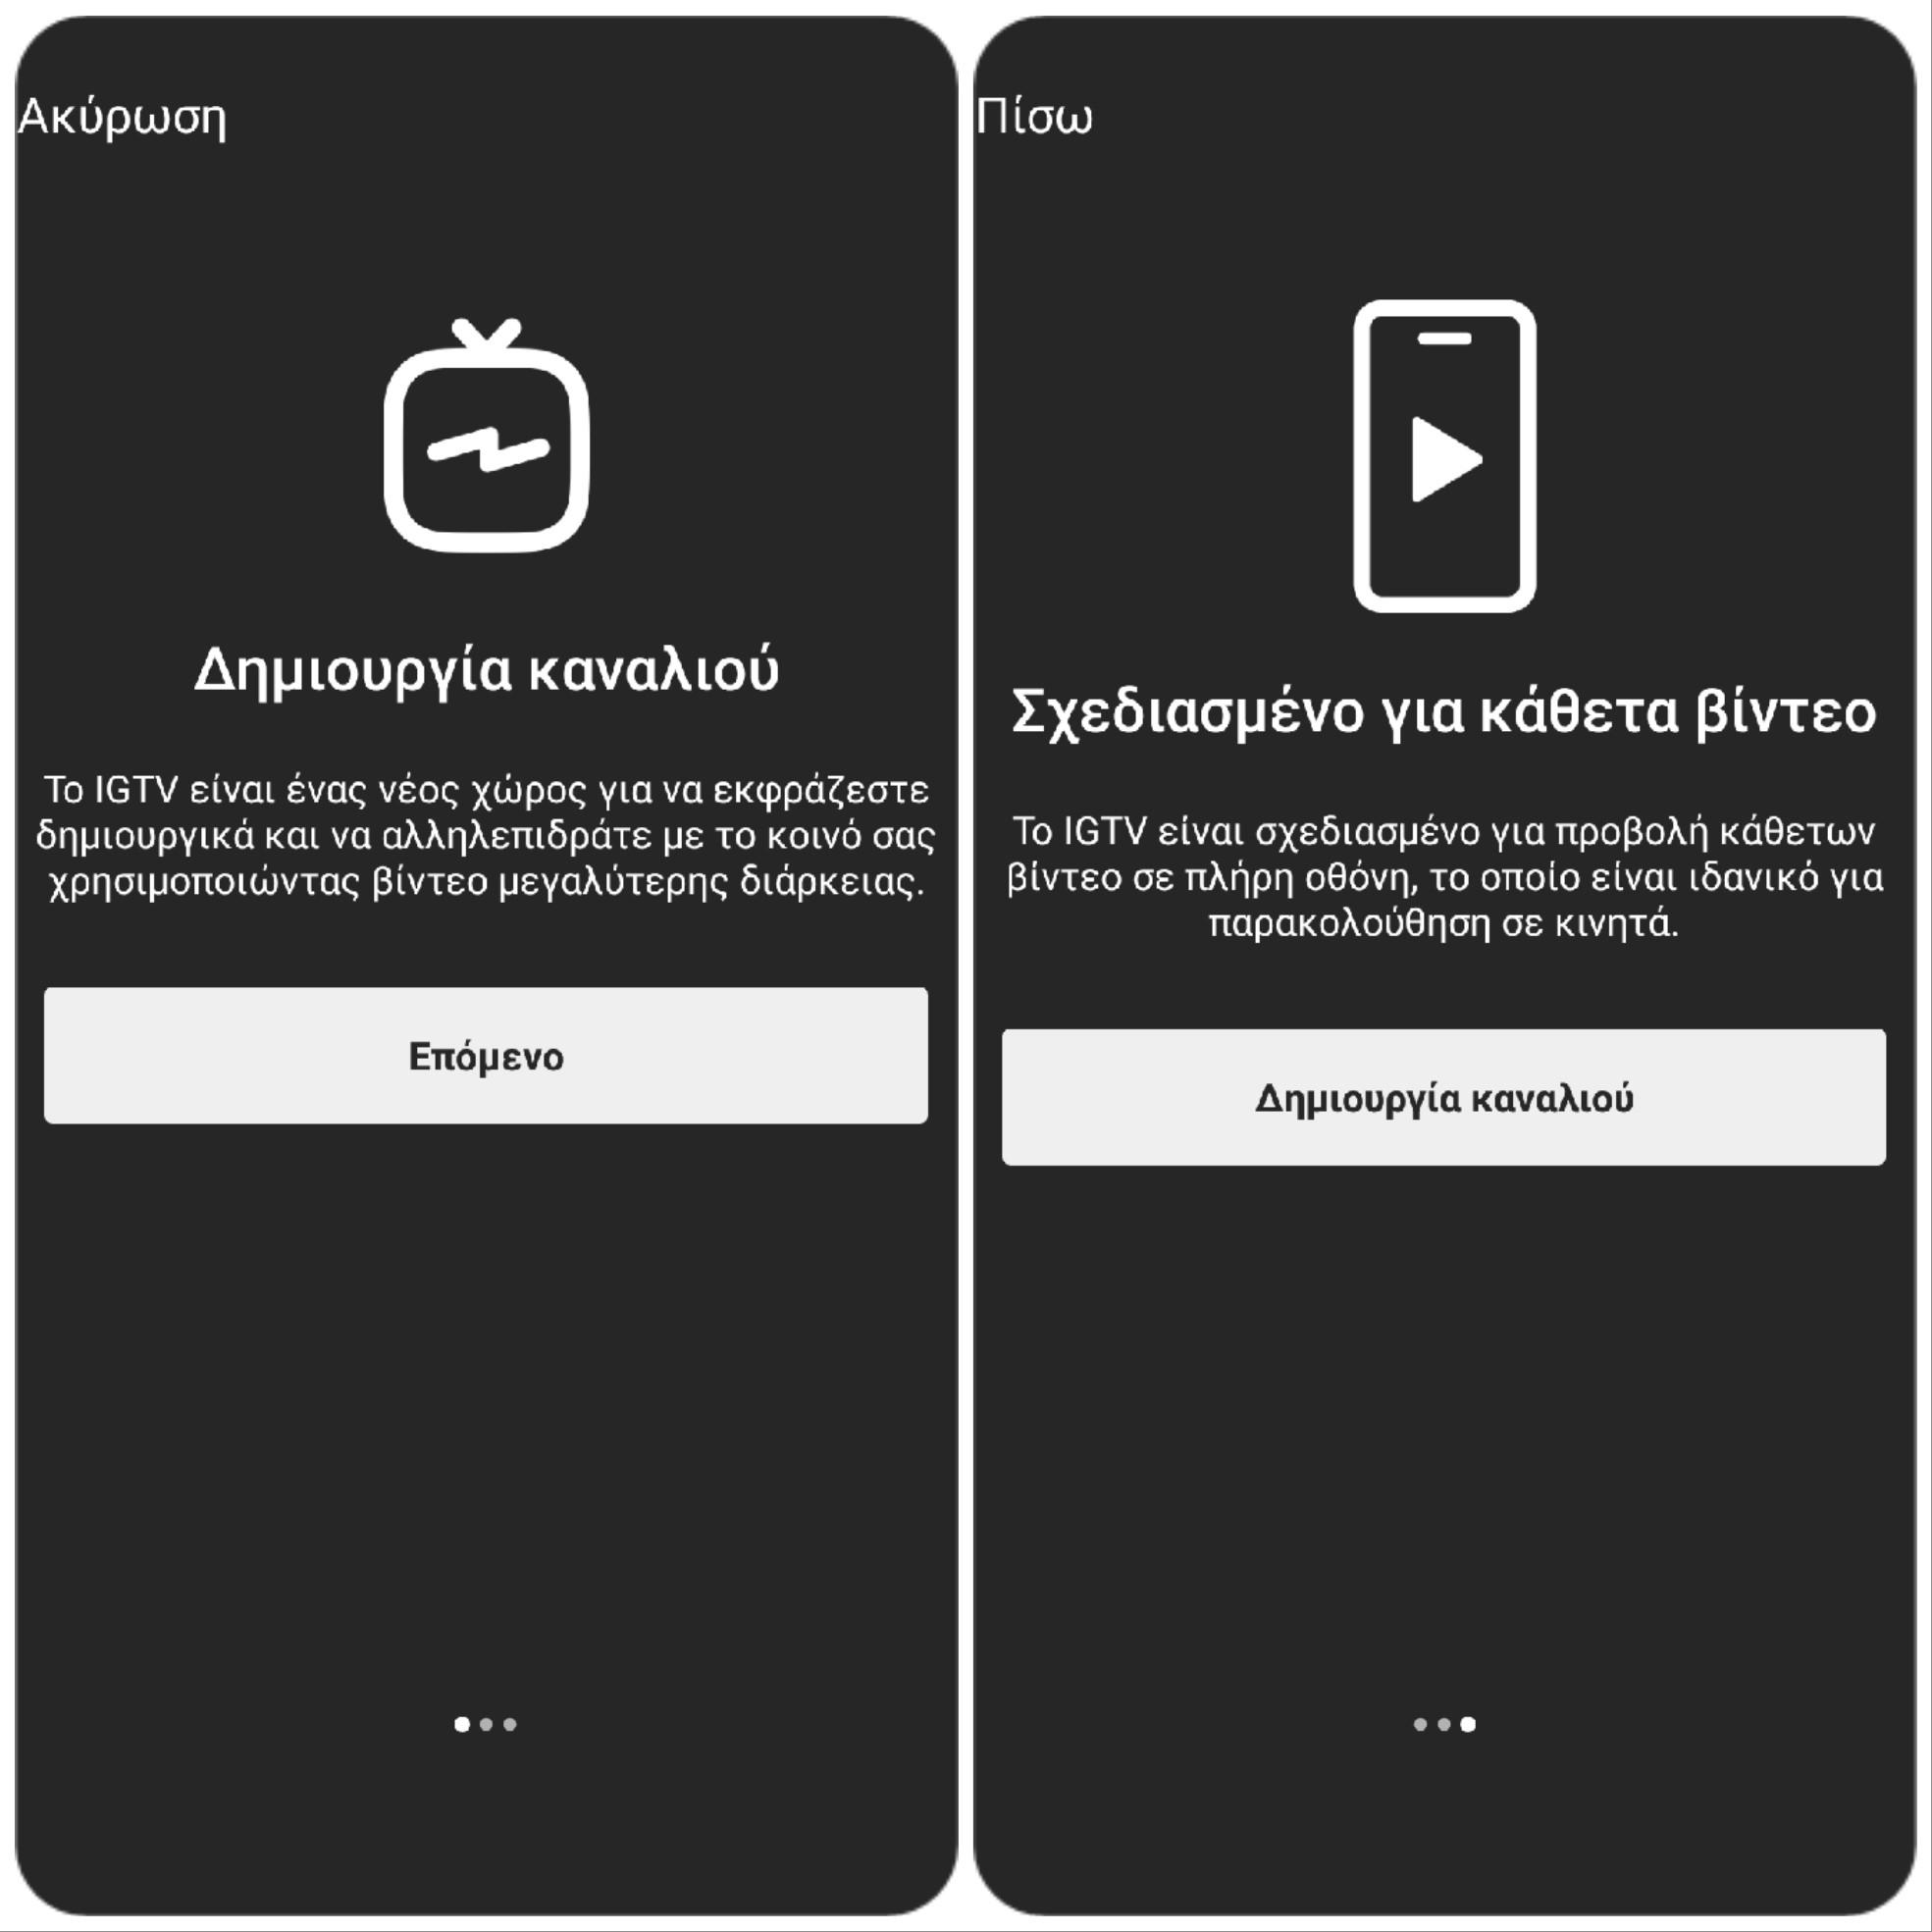 Instagram : 1 Δις Χρήστες & Καινούργια εφαρμογή για μεγάλα video 6